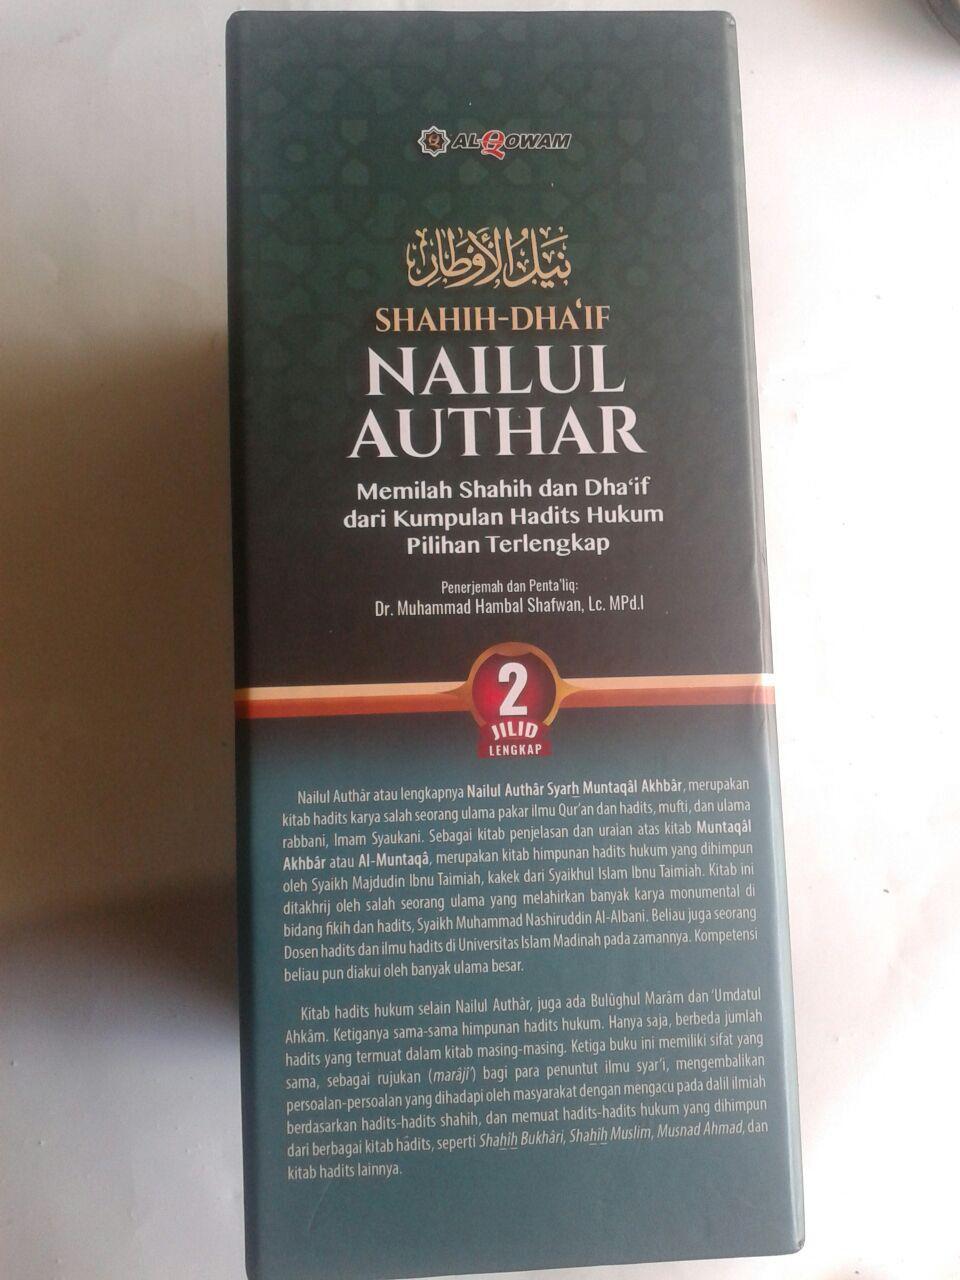 Buku Shahih Dhaif Nailul Authar Kumpulan Hadits Hukum Terlengkap cover 3